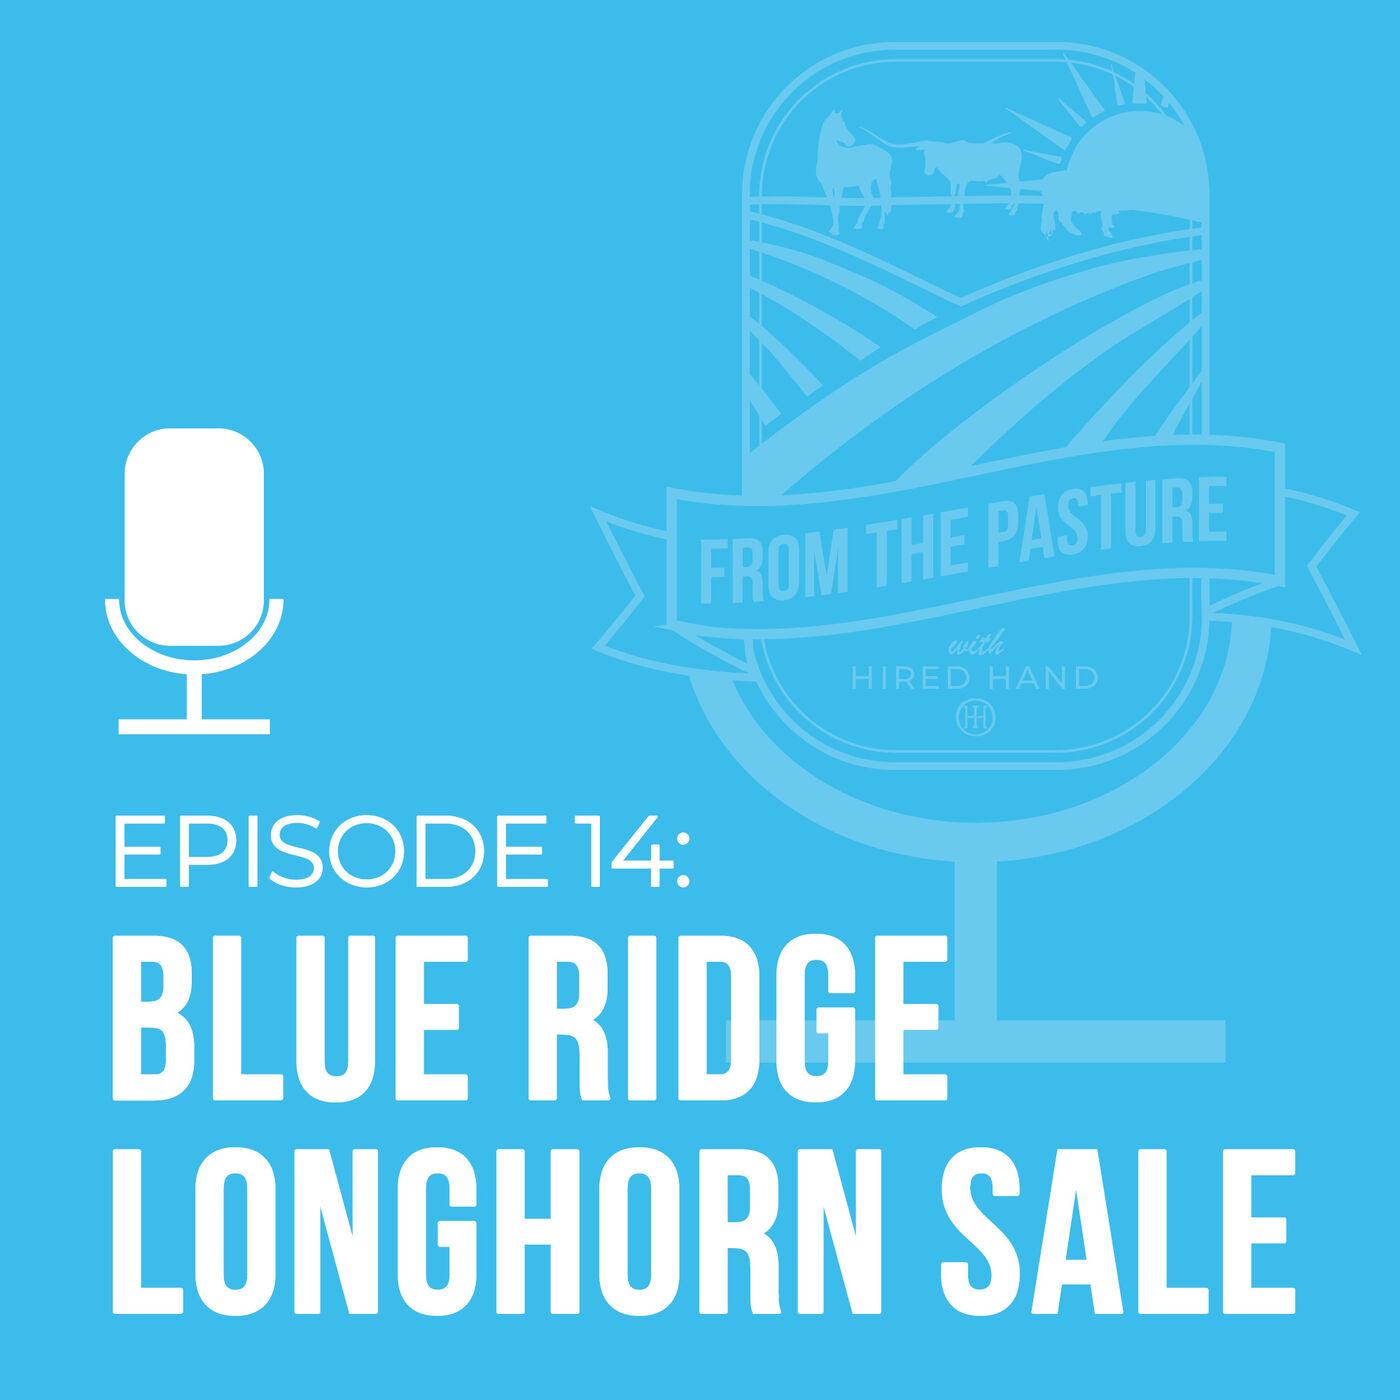 Blue Ridge Longhorns Online Only Sale